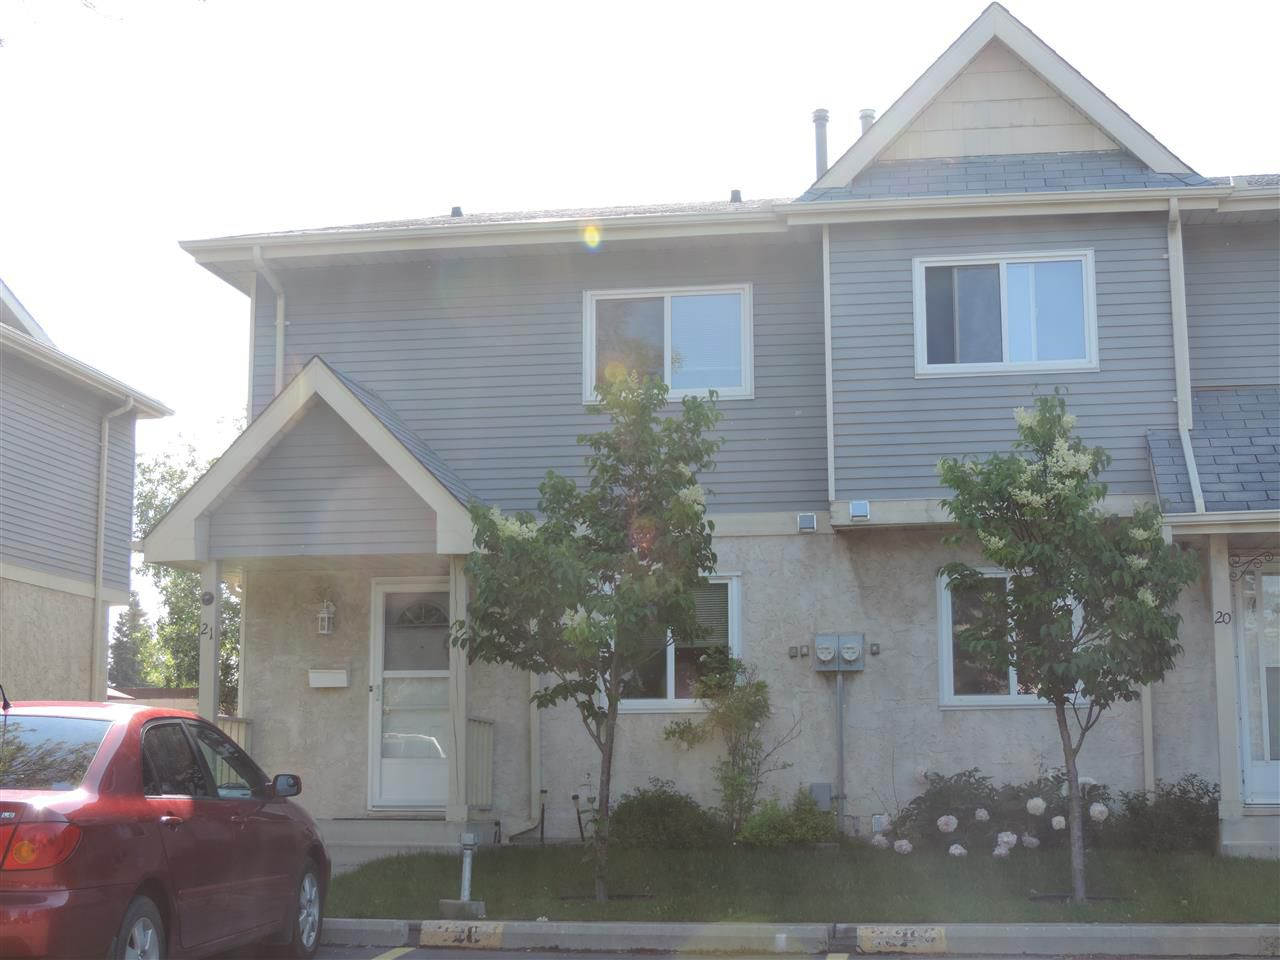 Main Photo: 21 9619 180 Street in Edmonton: Zone 20 Townhouse for sale : MLS®# E4164426